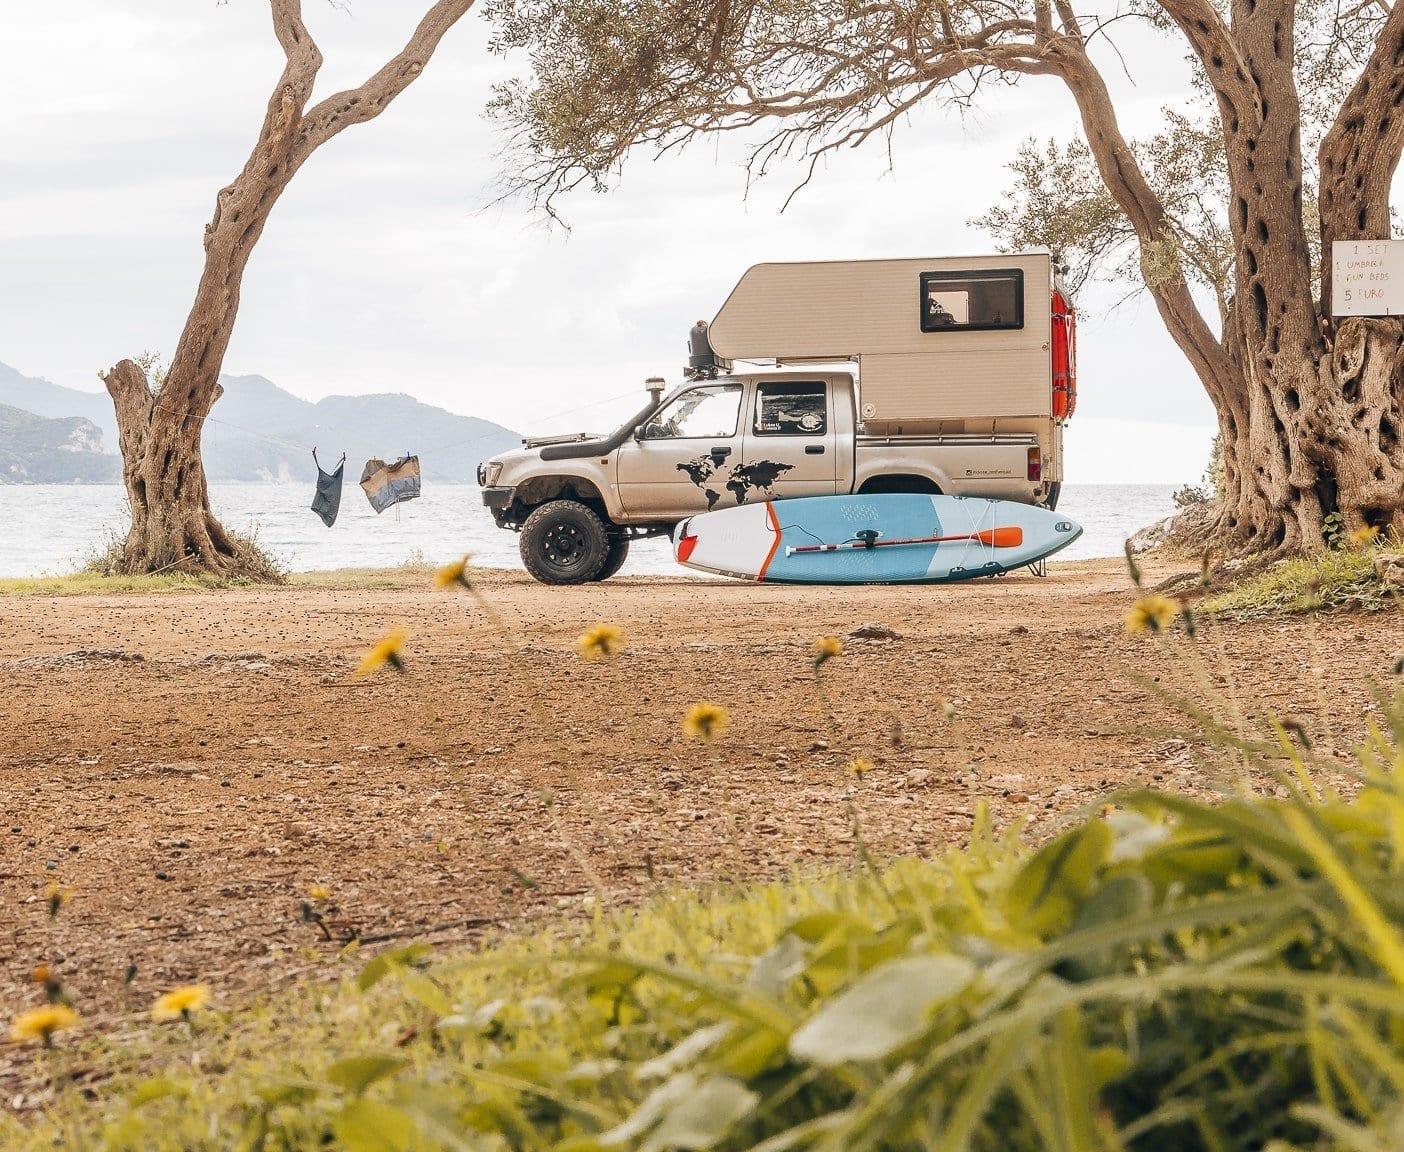 toyota-hilux-ln-105-camper-pickup-vanlife-kaufen-ausbau-4